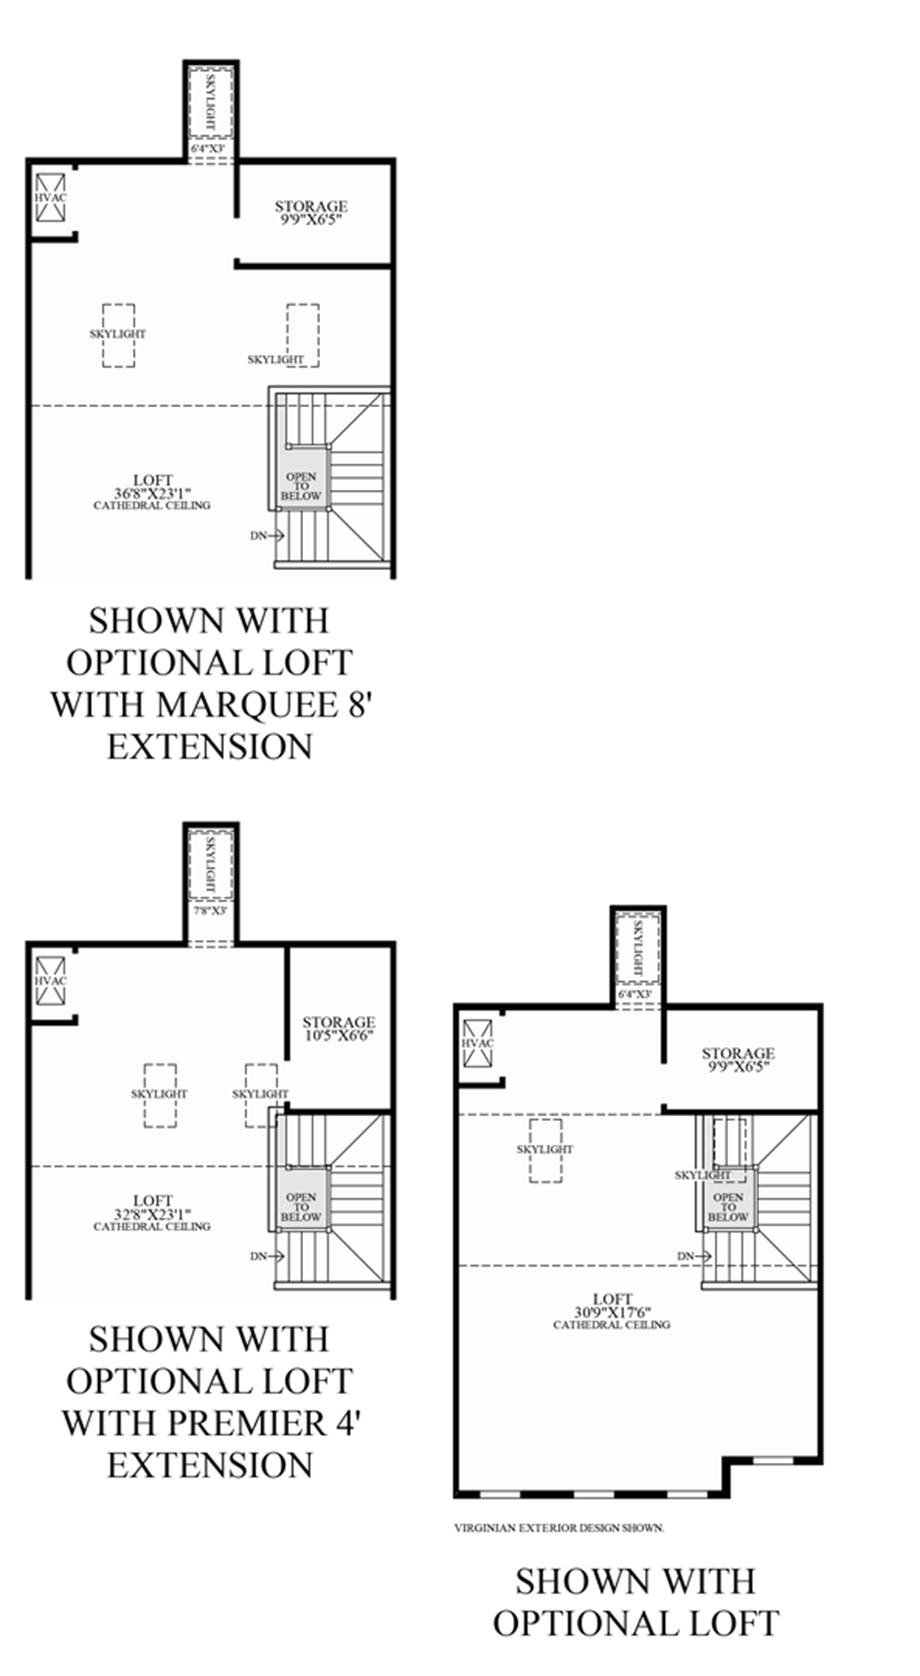 Optional Loft Floor Plan